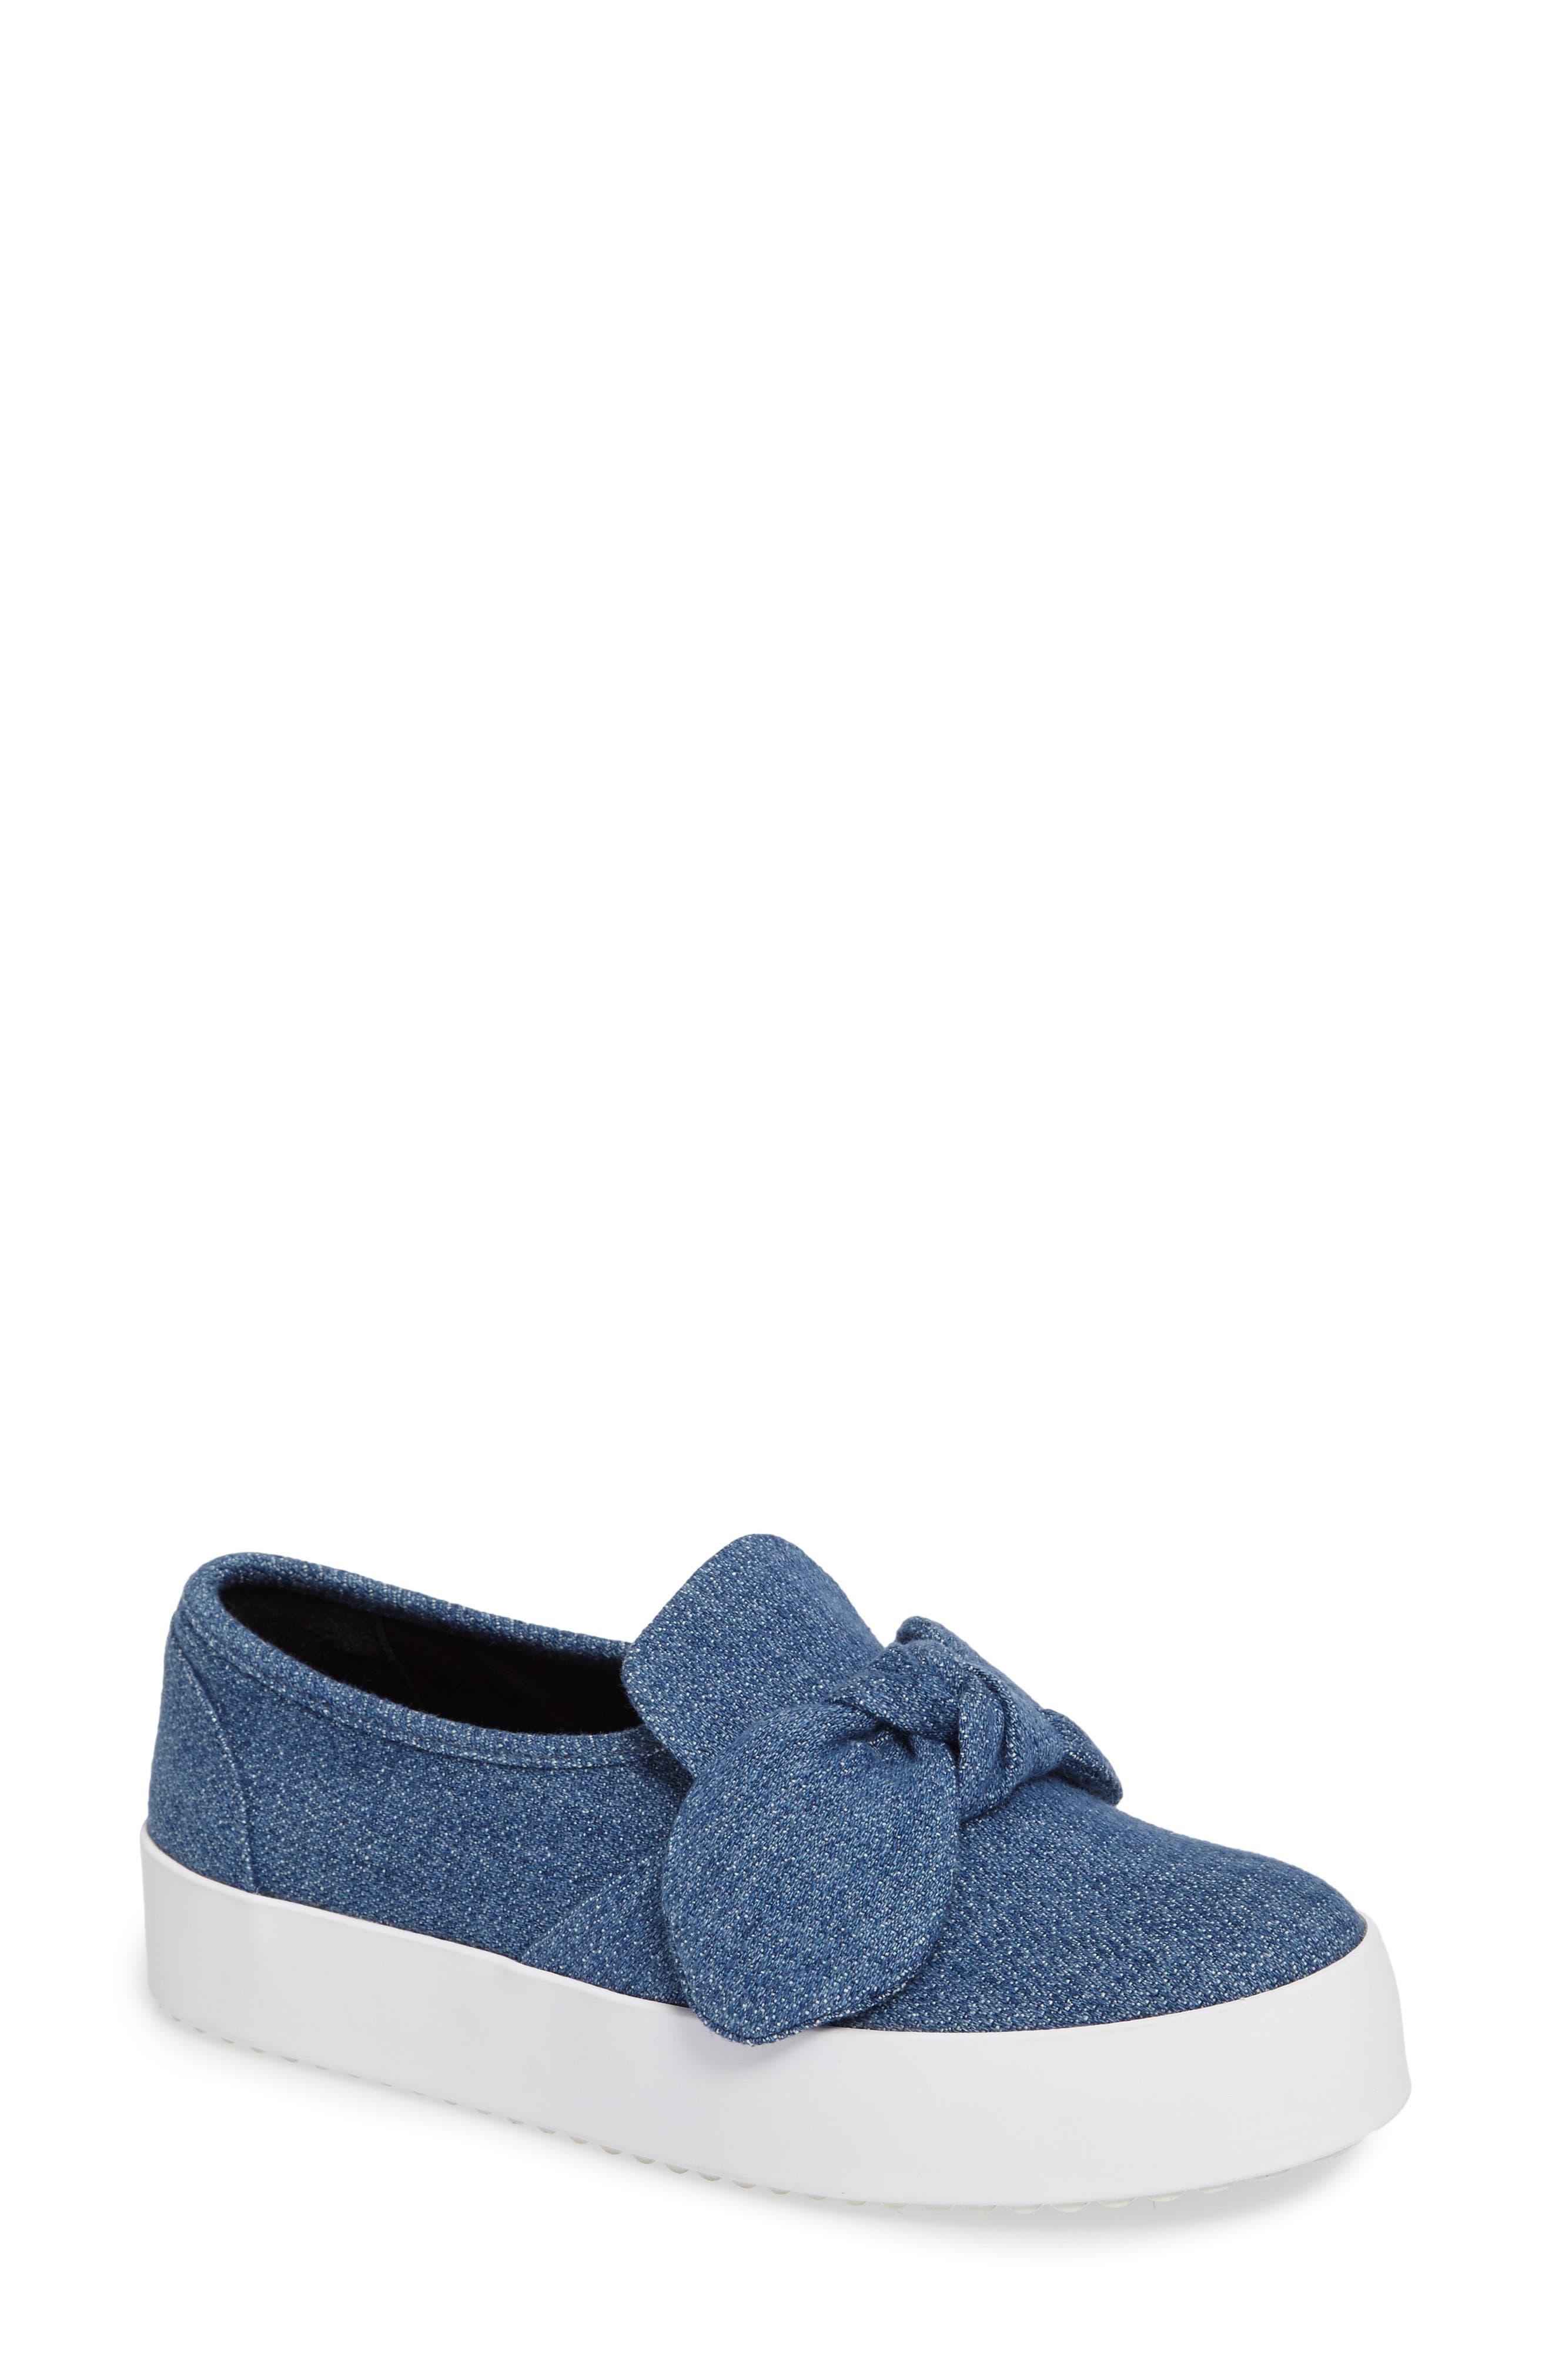 Alternate Image 1 Selected - Rebecca Minkoff Stacey Bow Platform Sneaker (Women)